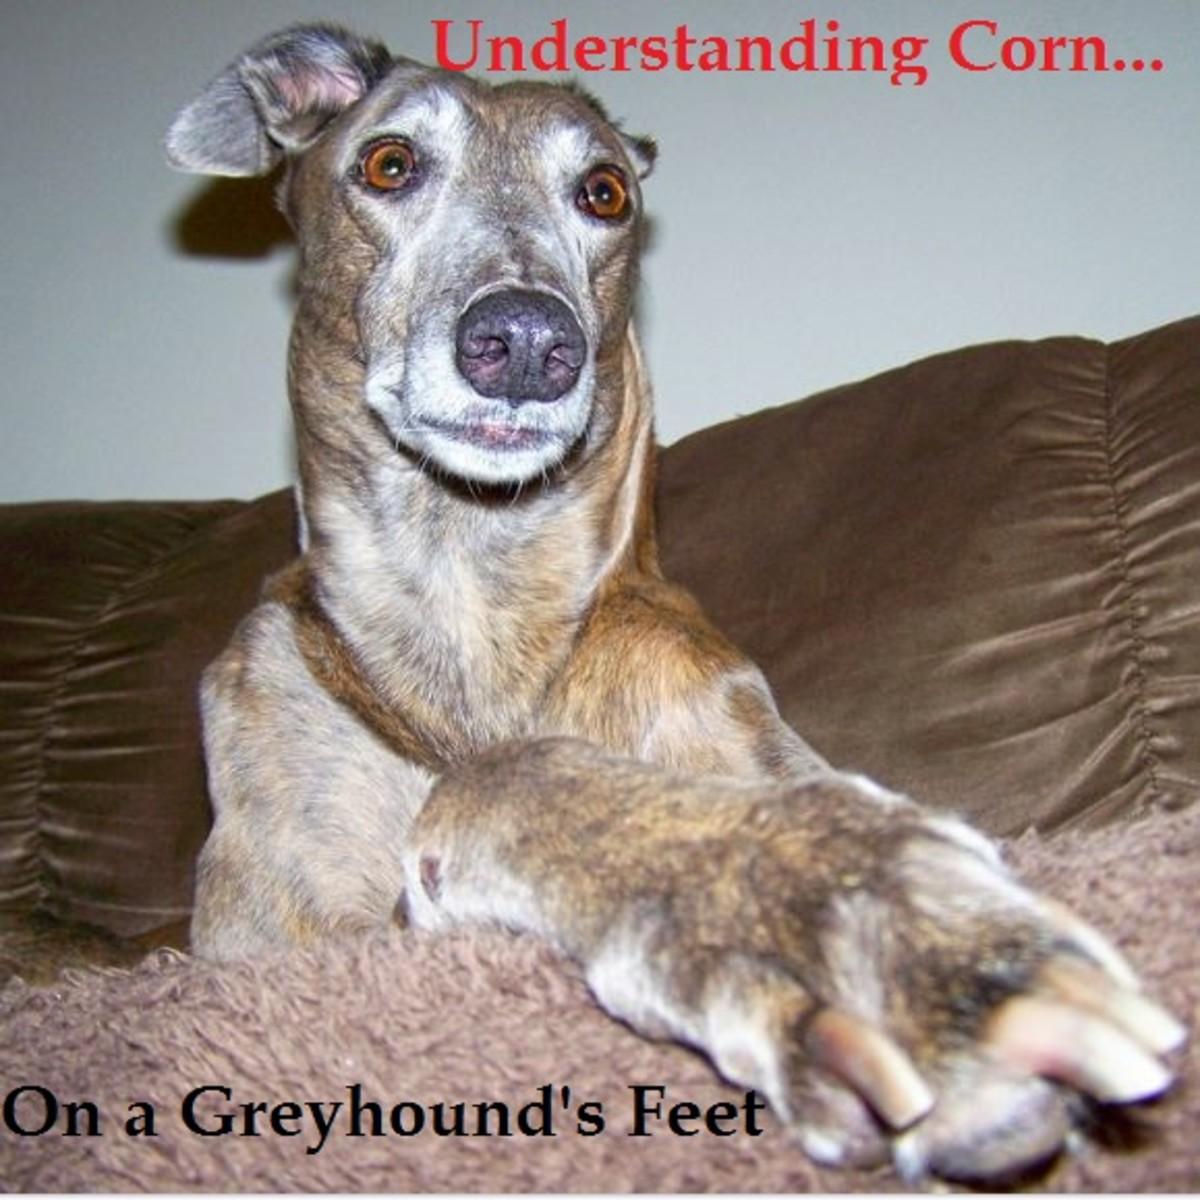 corn greyhound feet